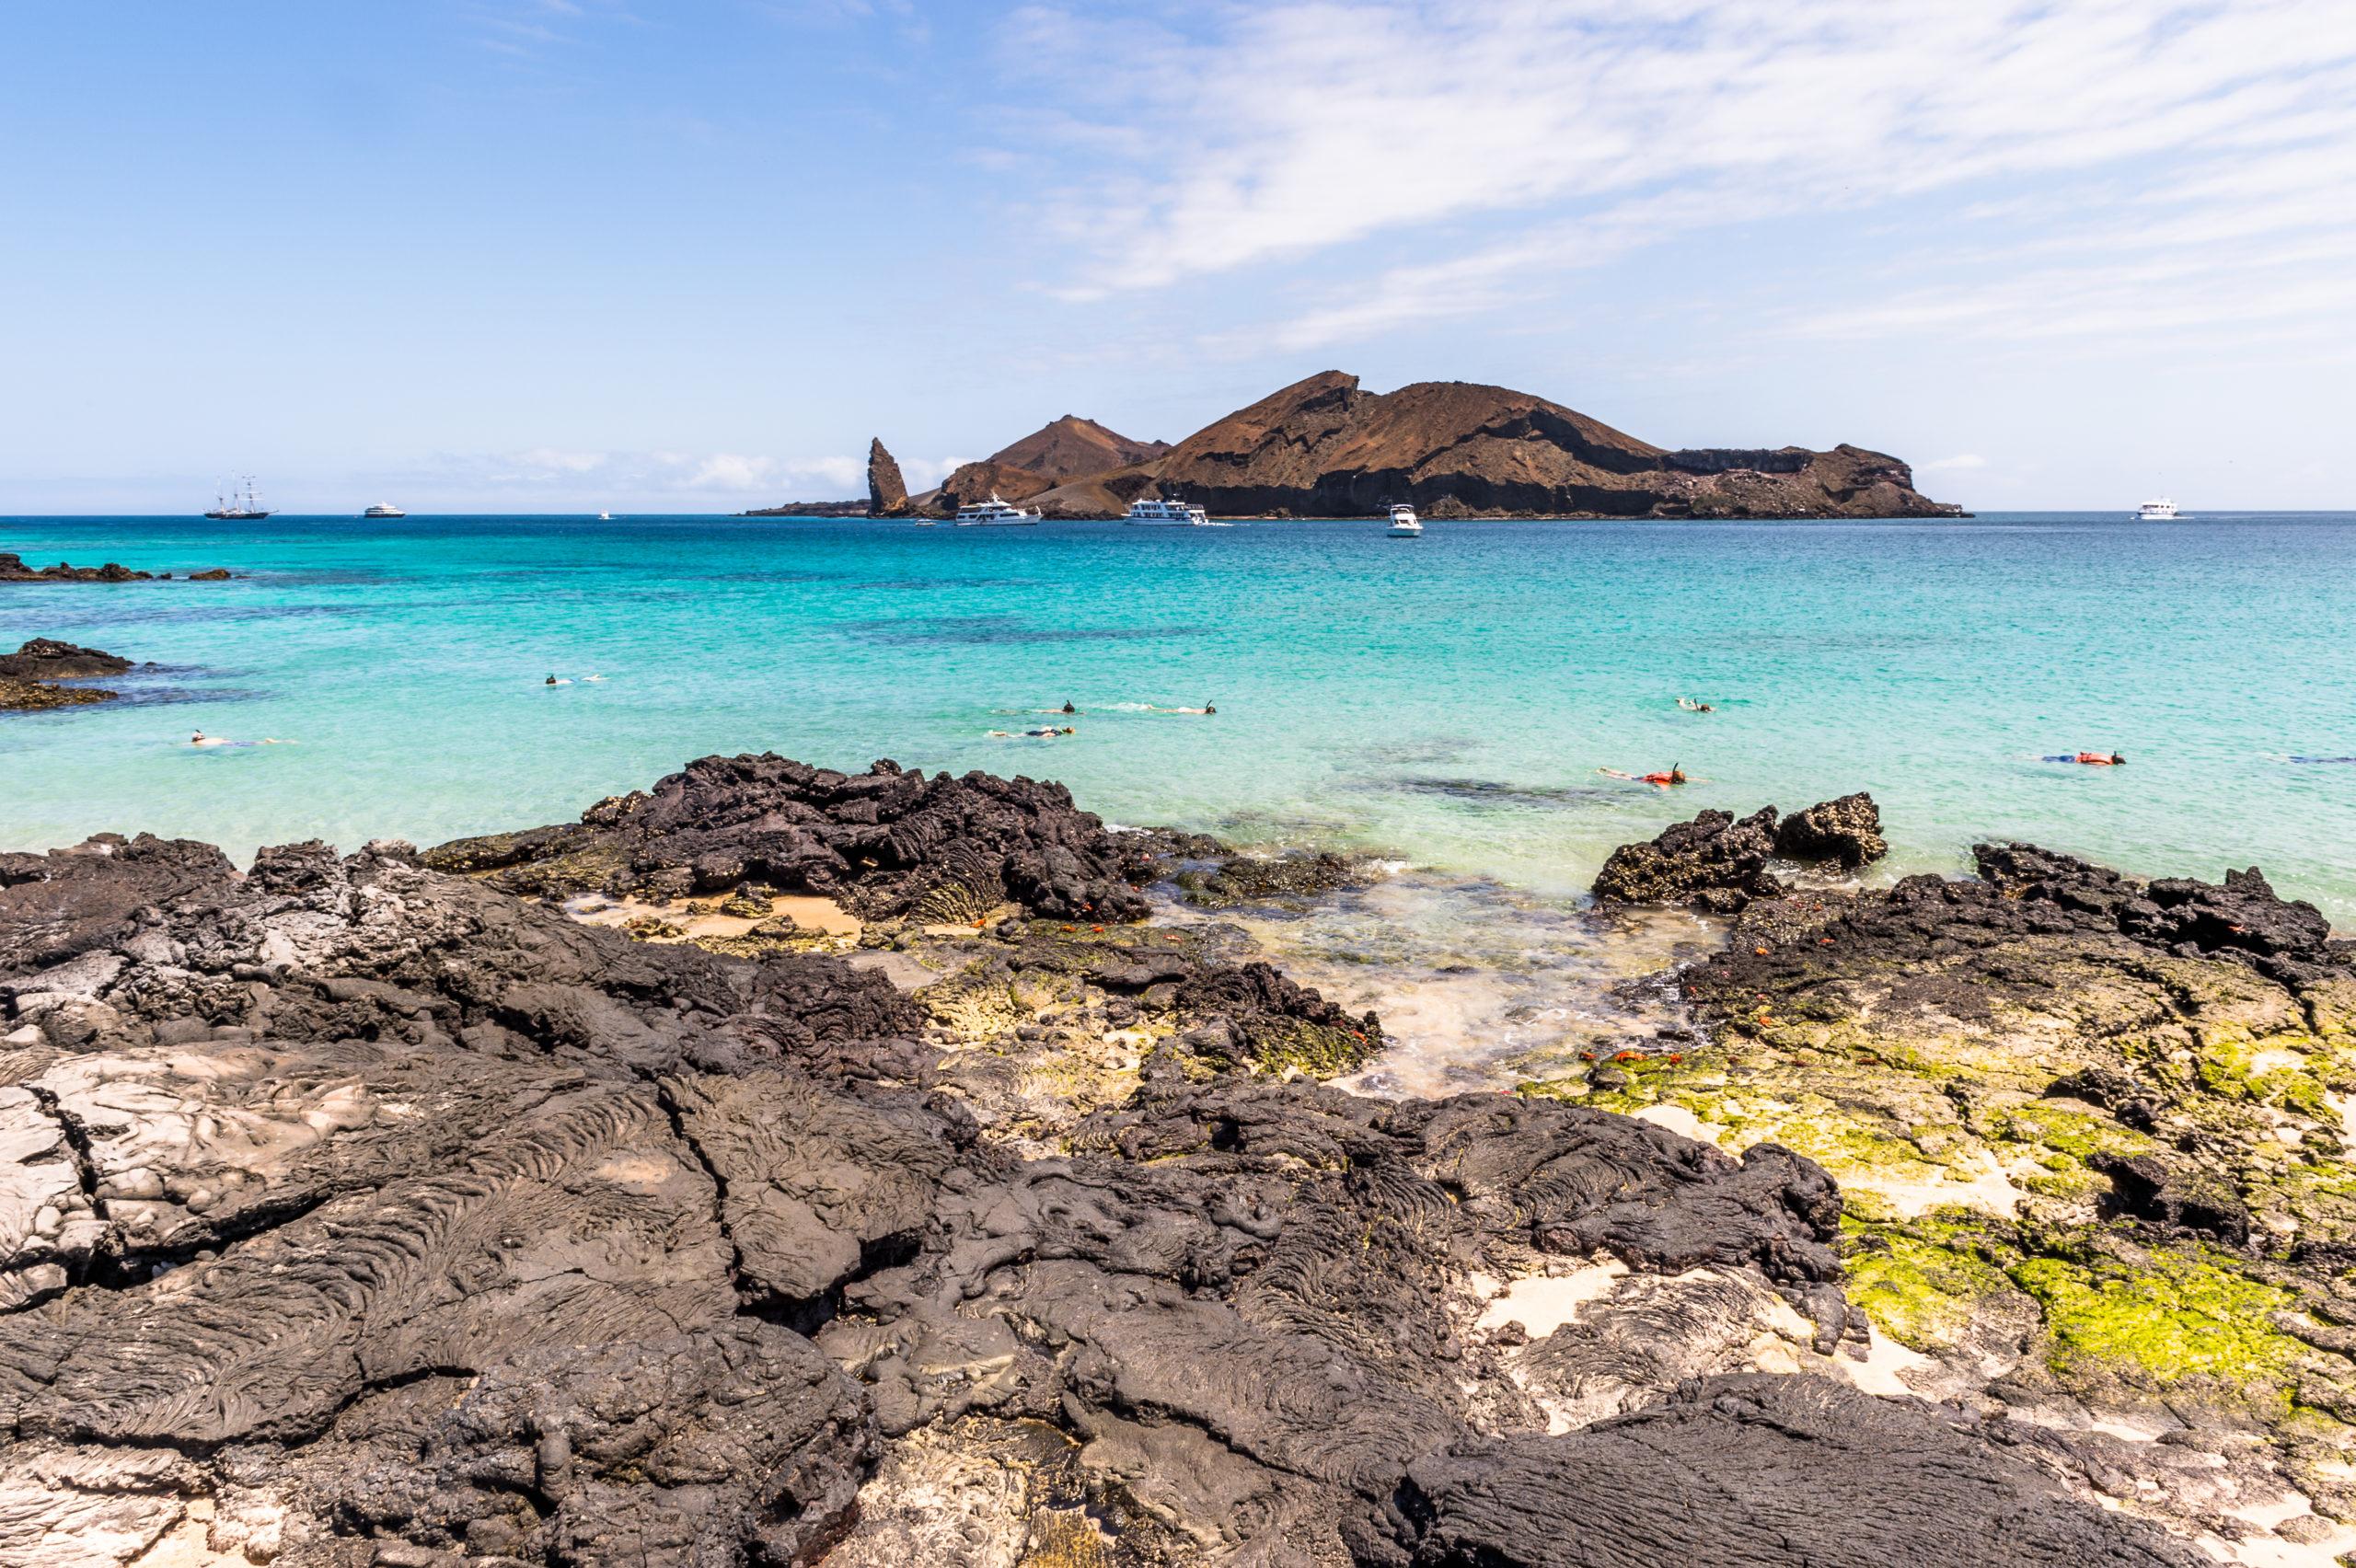 day-2-santiago-island-galapagos-islands-2